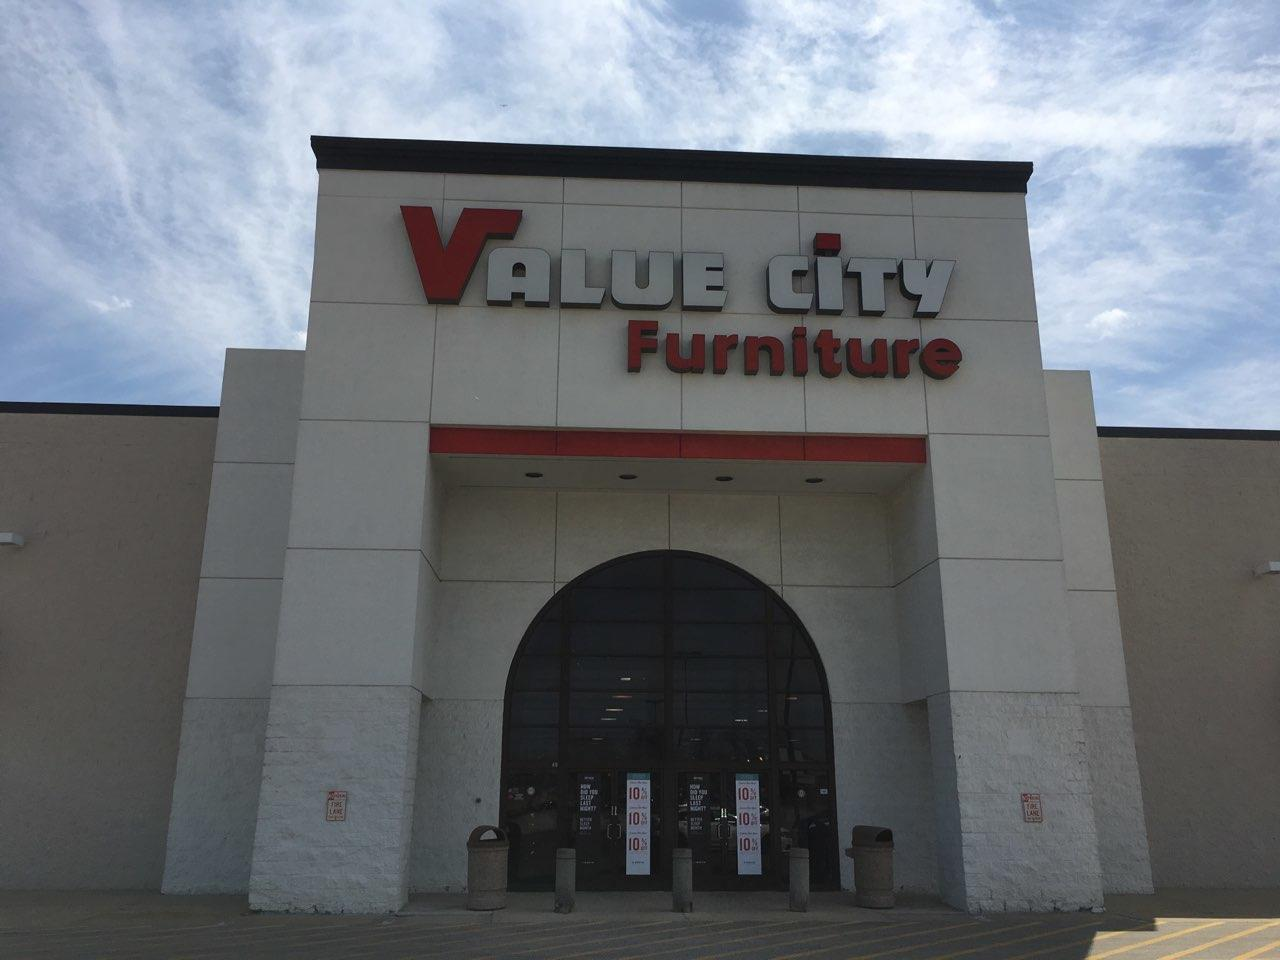 Value City Furniture image 6